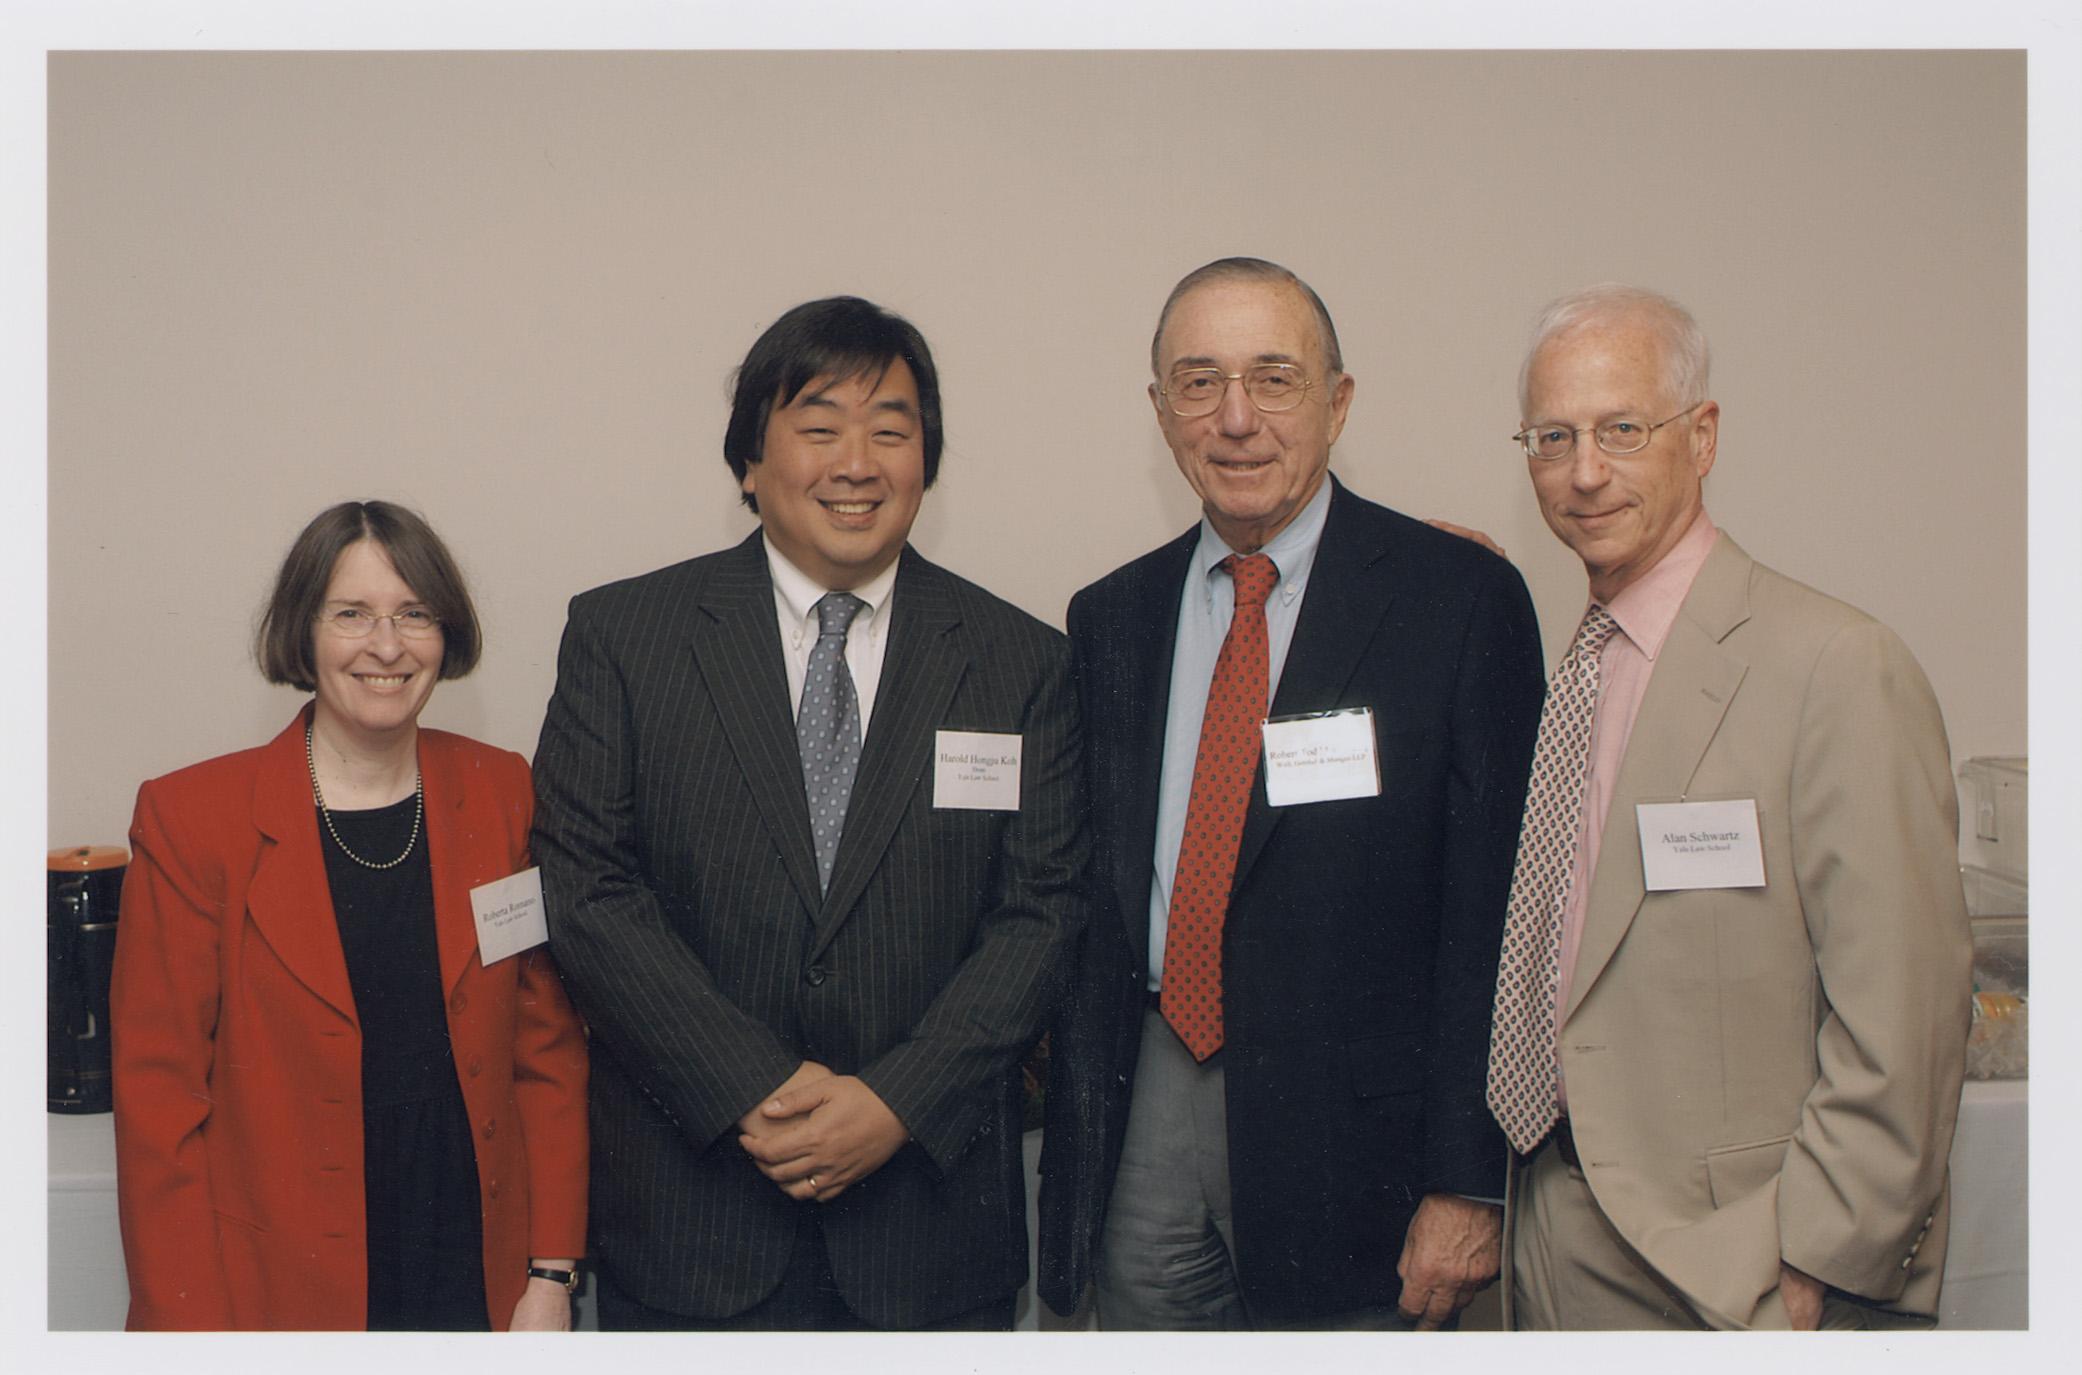 YLS Prof. and Center Dir. Roberta Romano '80, YLS Dean Harold Hongju Koh, Robert Todd Lang '47, and YLS Prof. Alan Schwartz '64